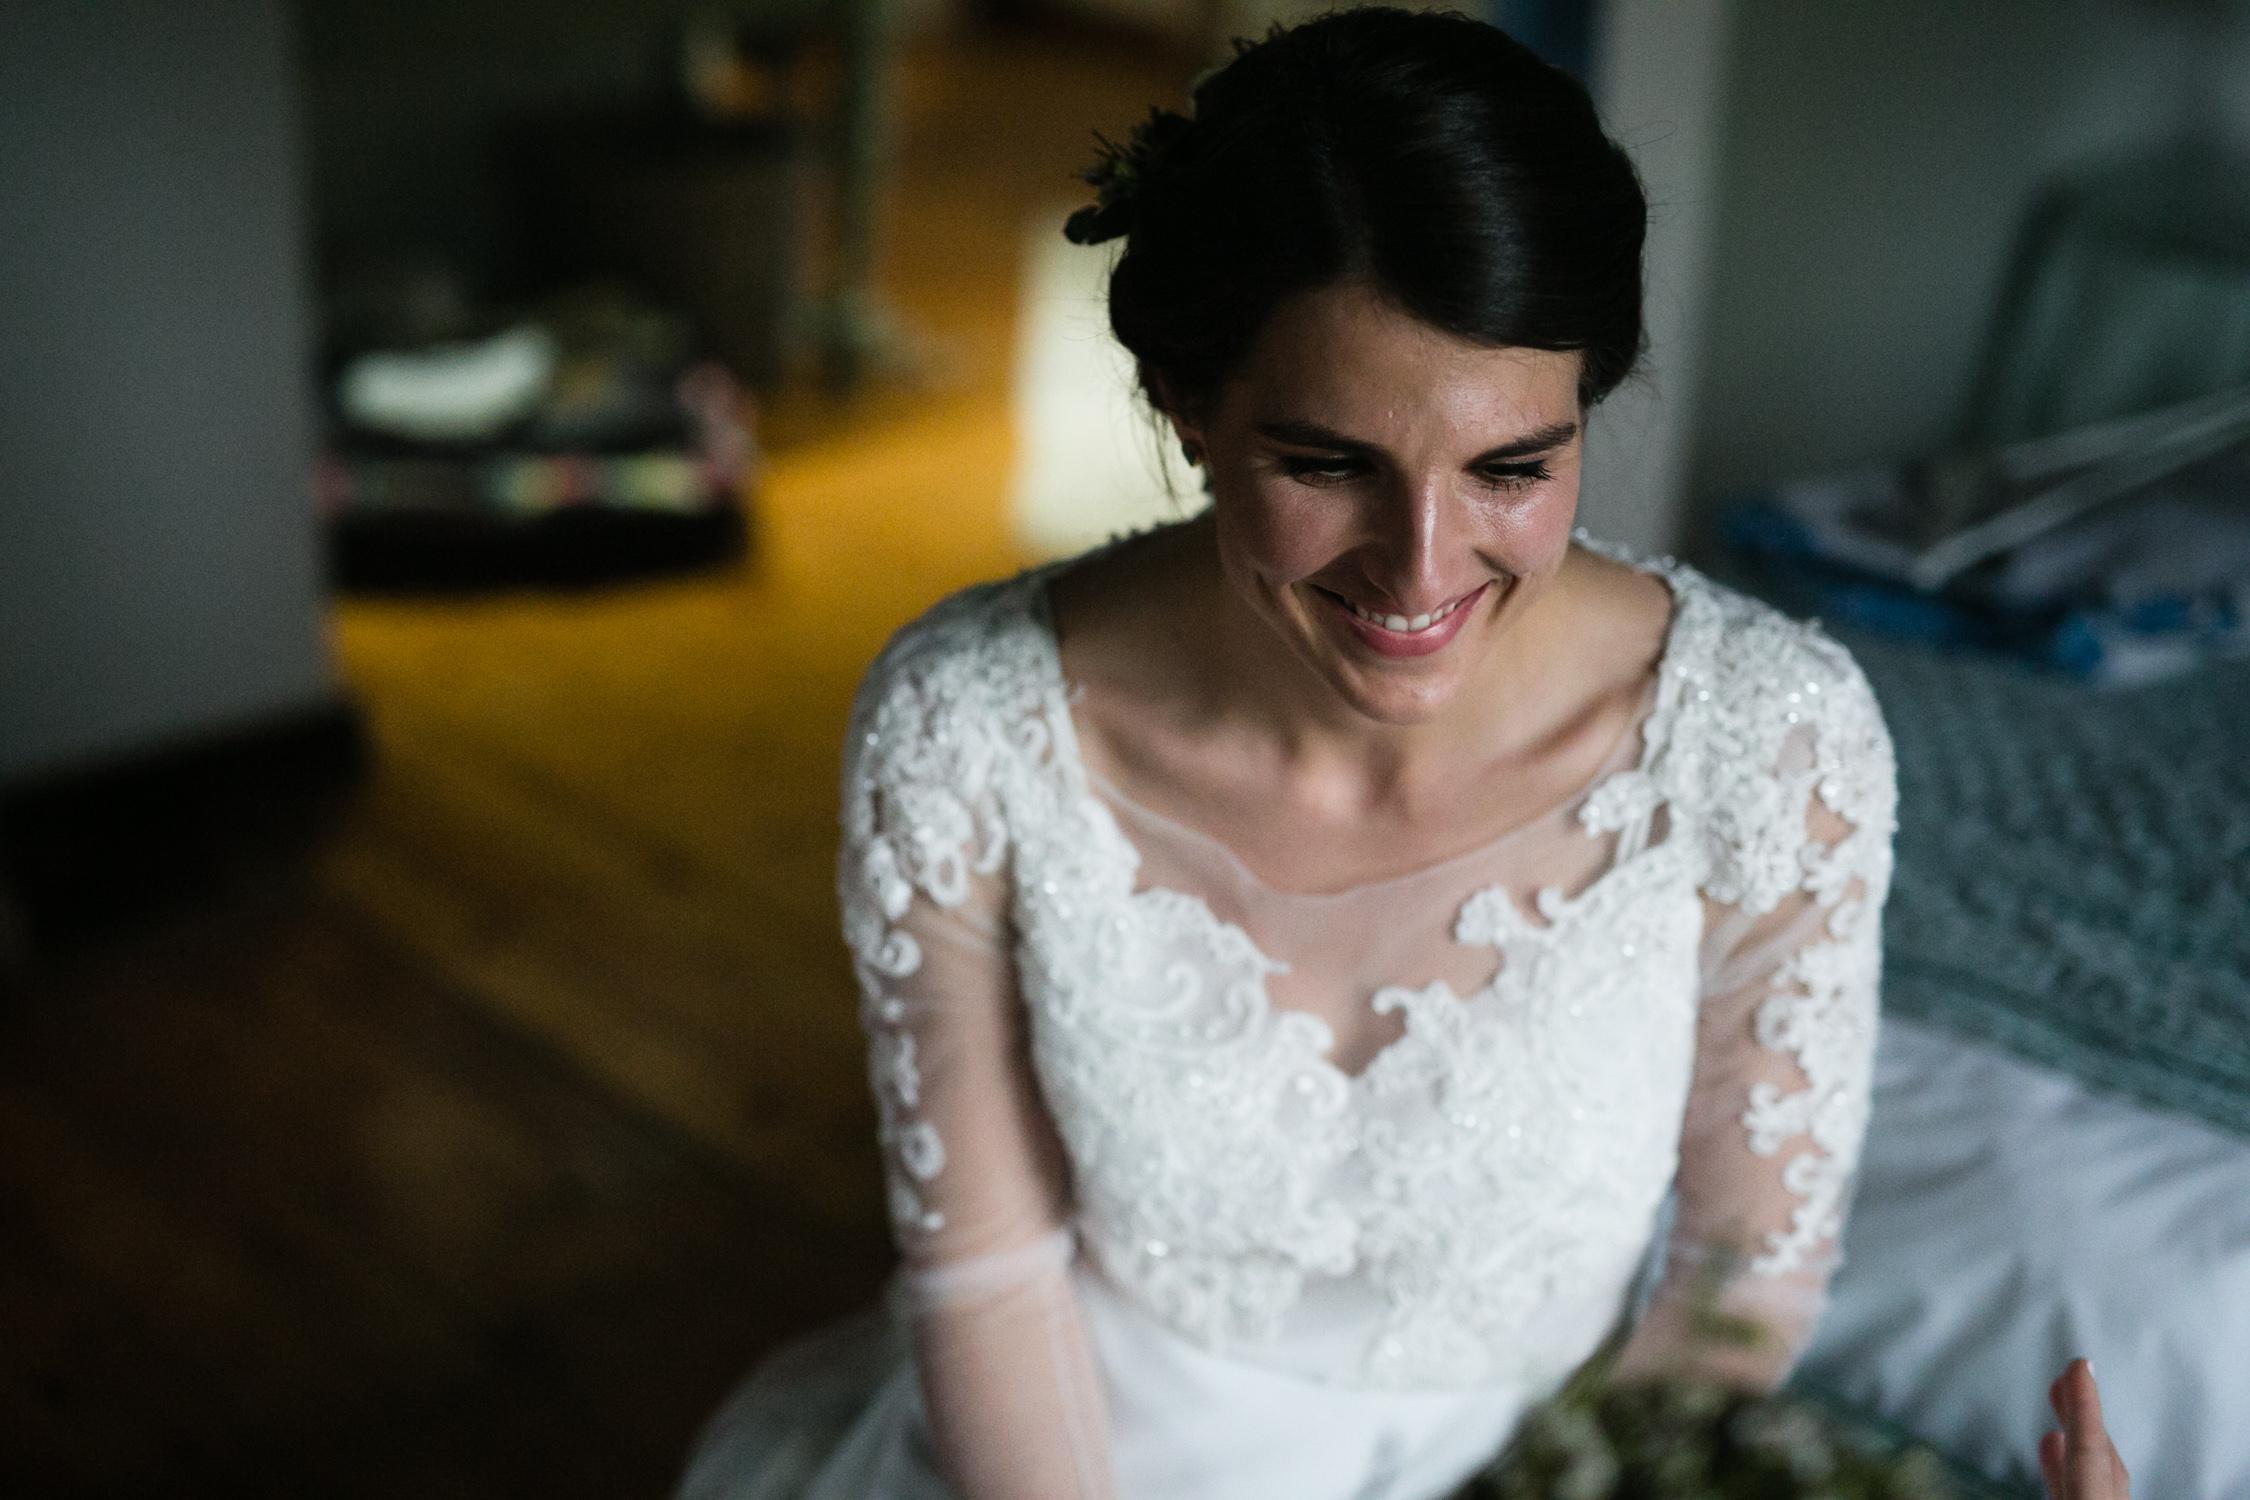 heisvisual-wedding-photographers-documentary-midlands-south-africa024.jpg